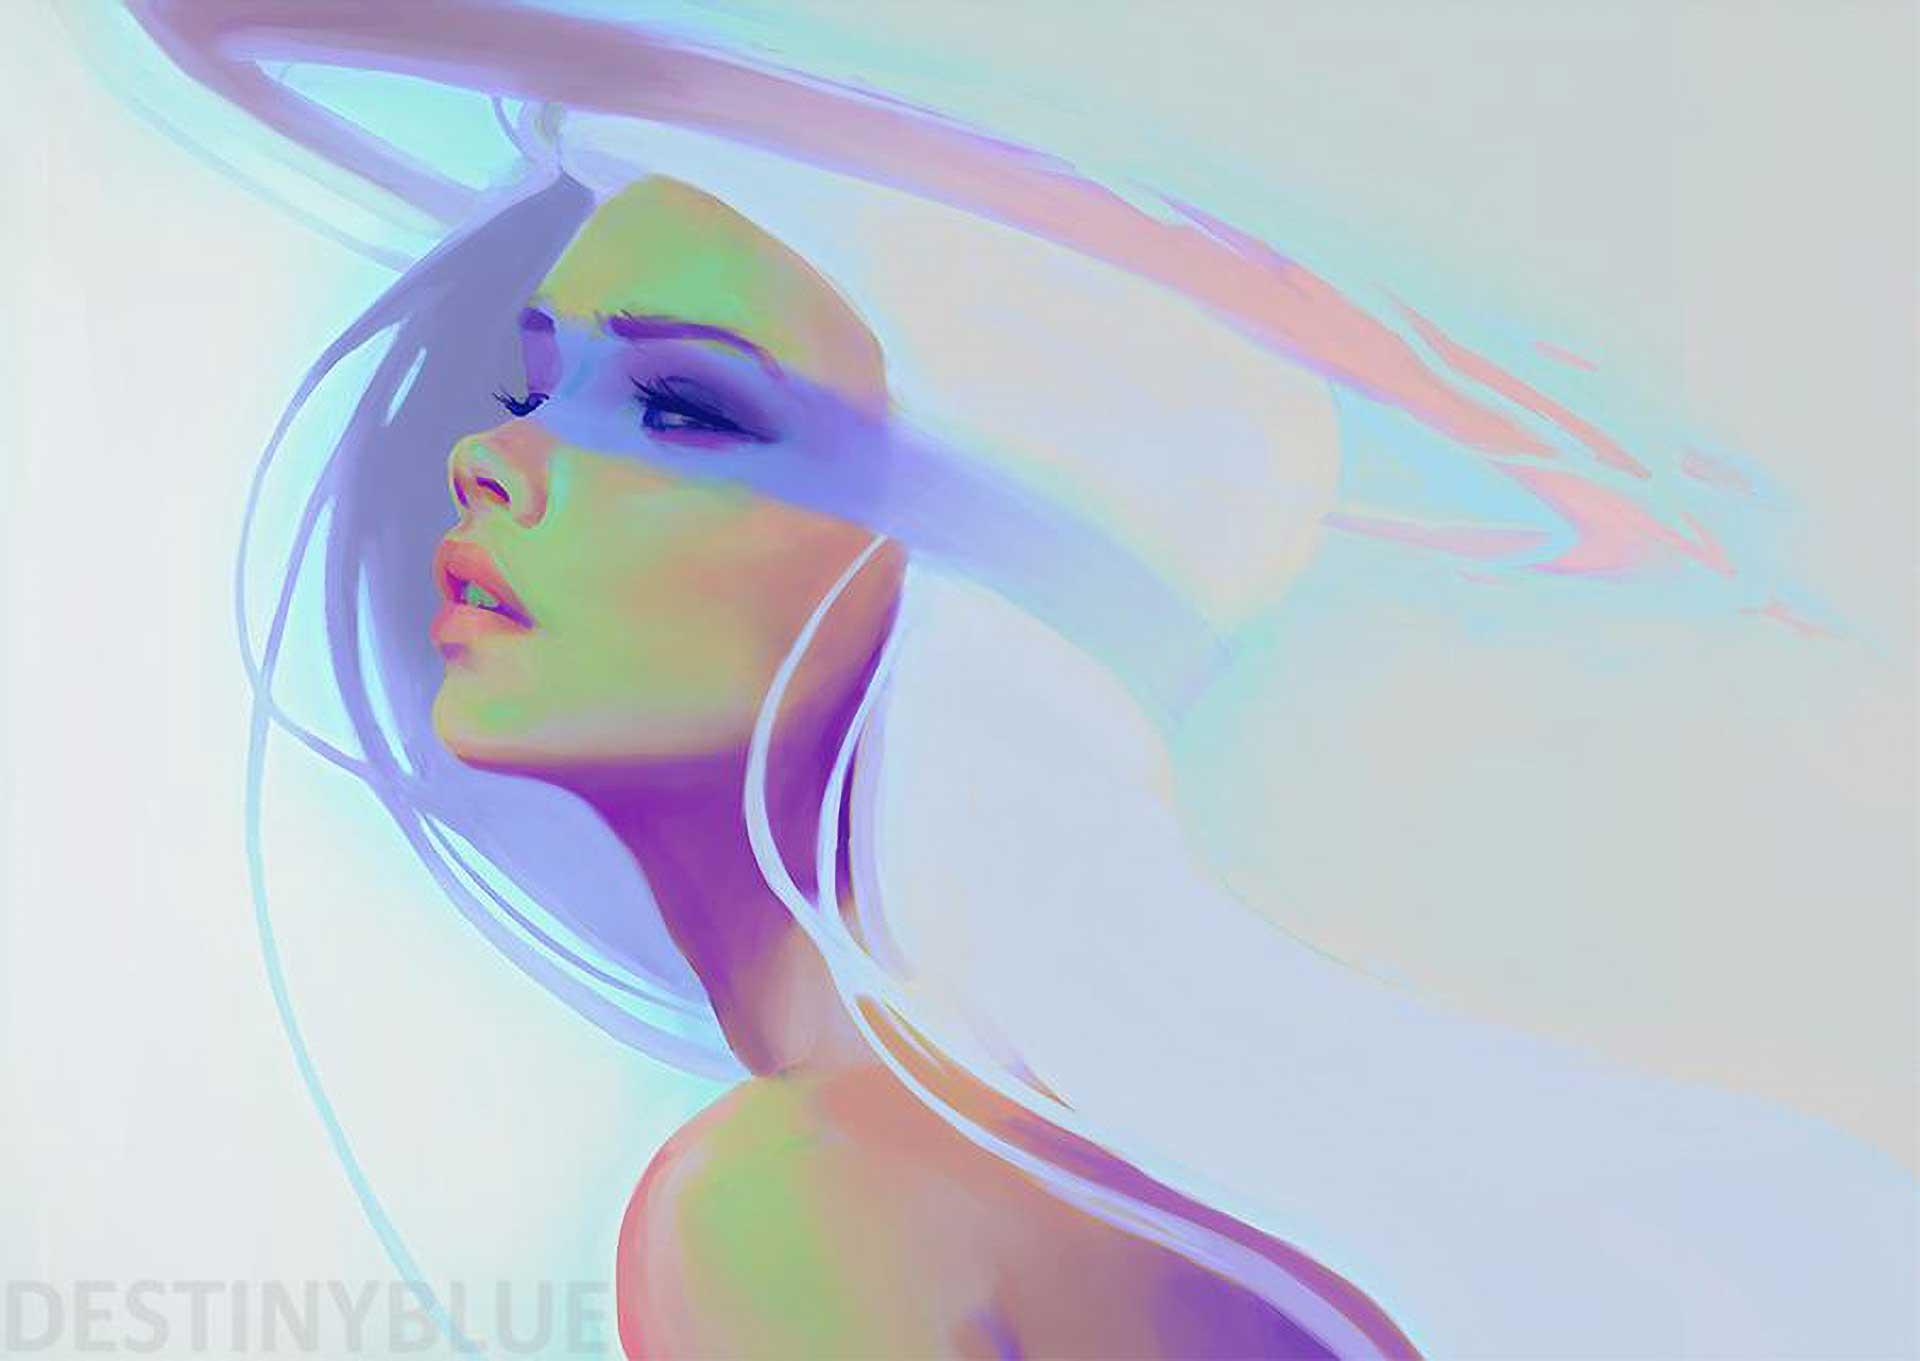 Inspirational Art Dark Side by Artist DestinyBlue, real name Alice de Ste Croix